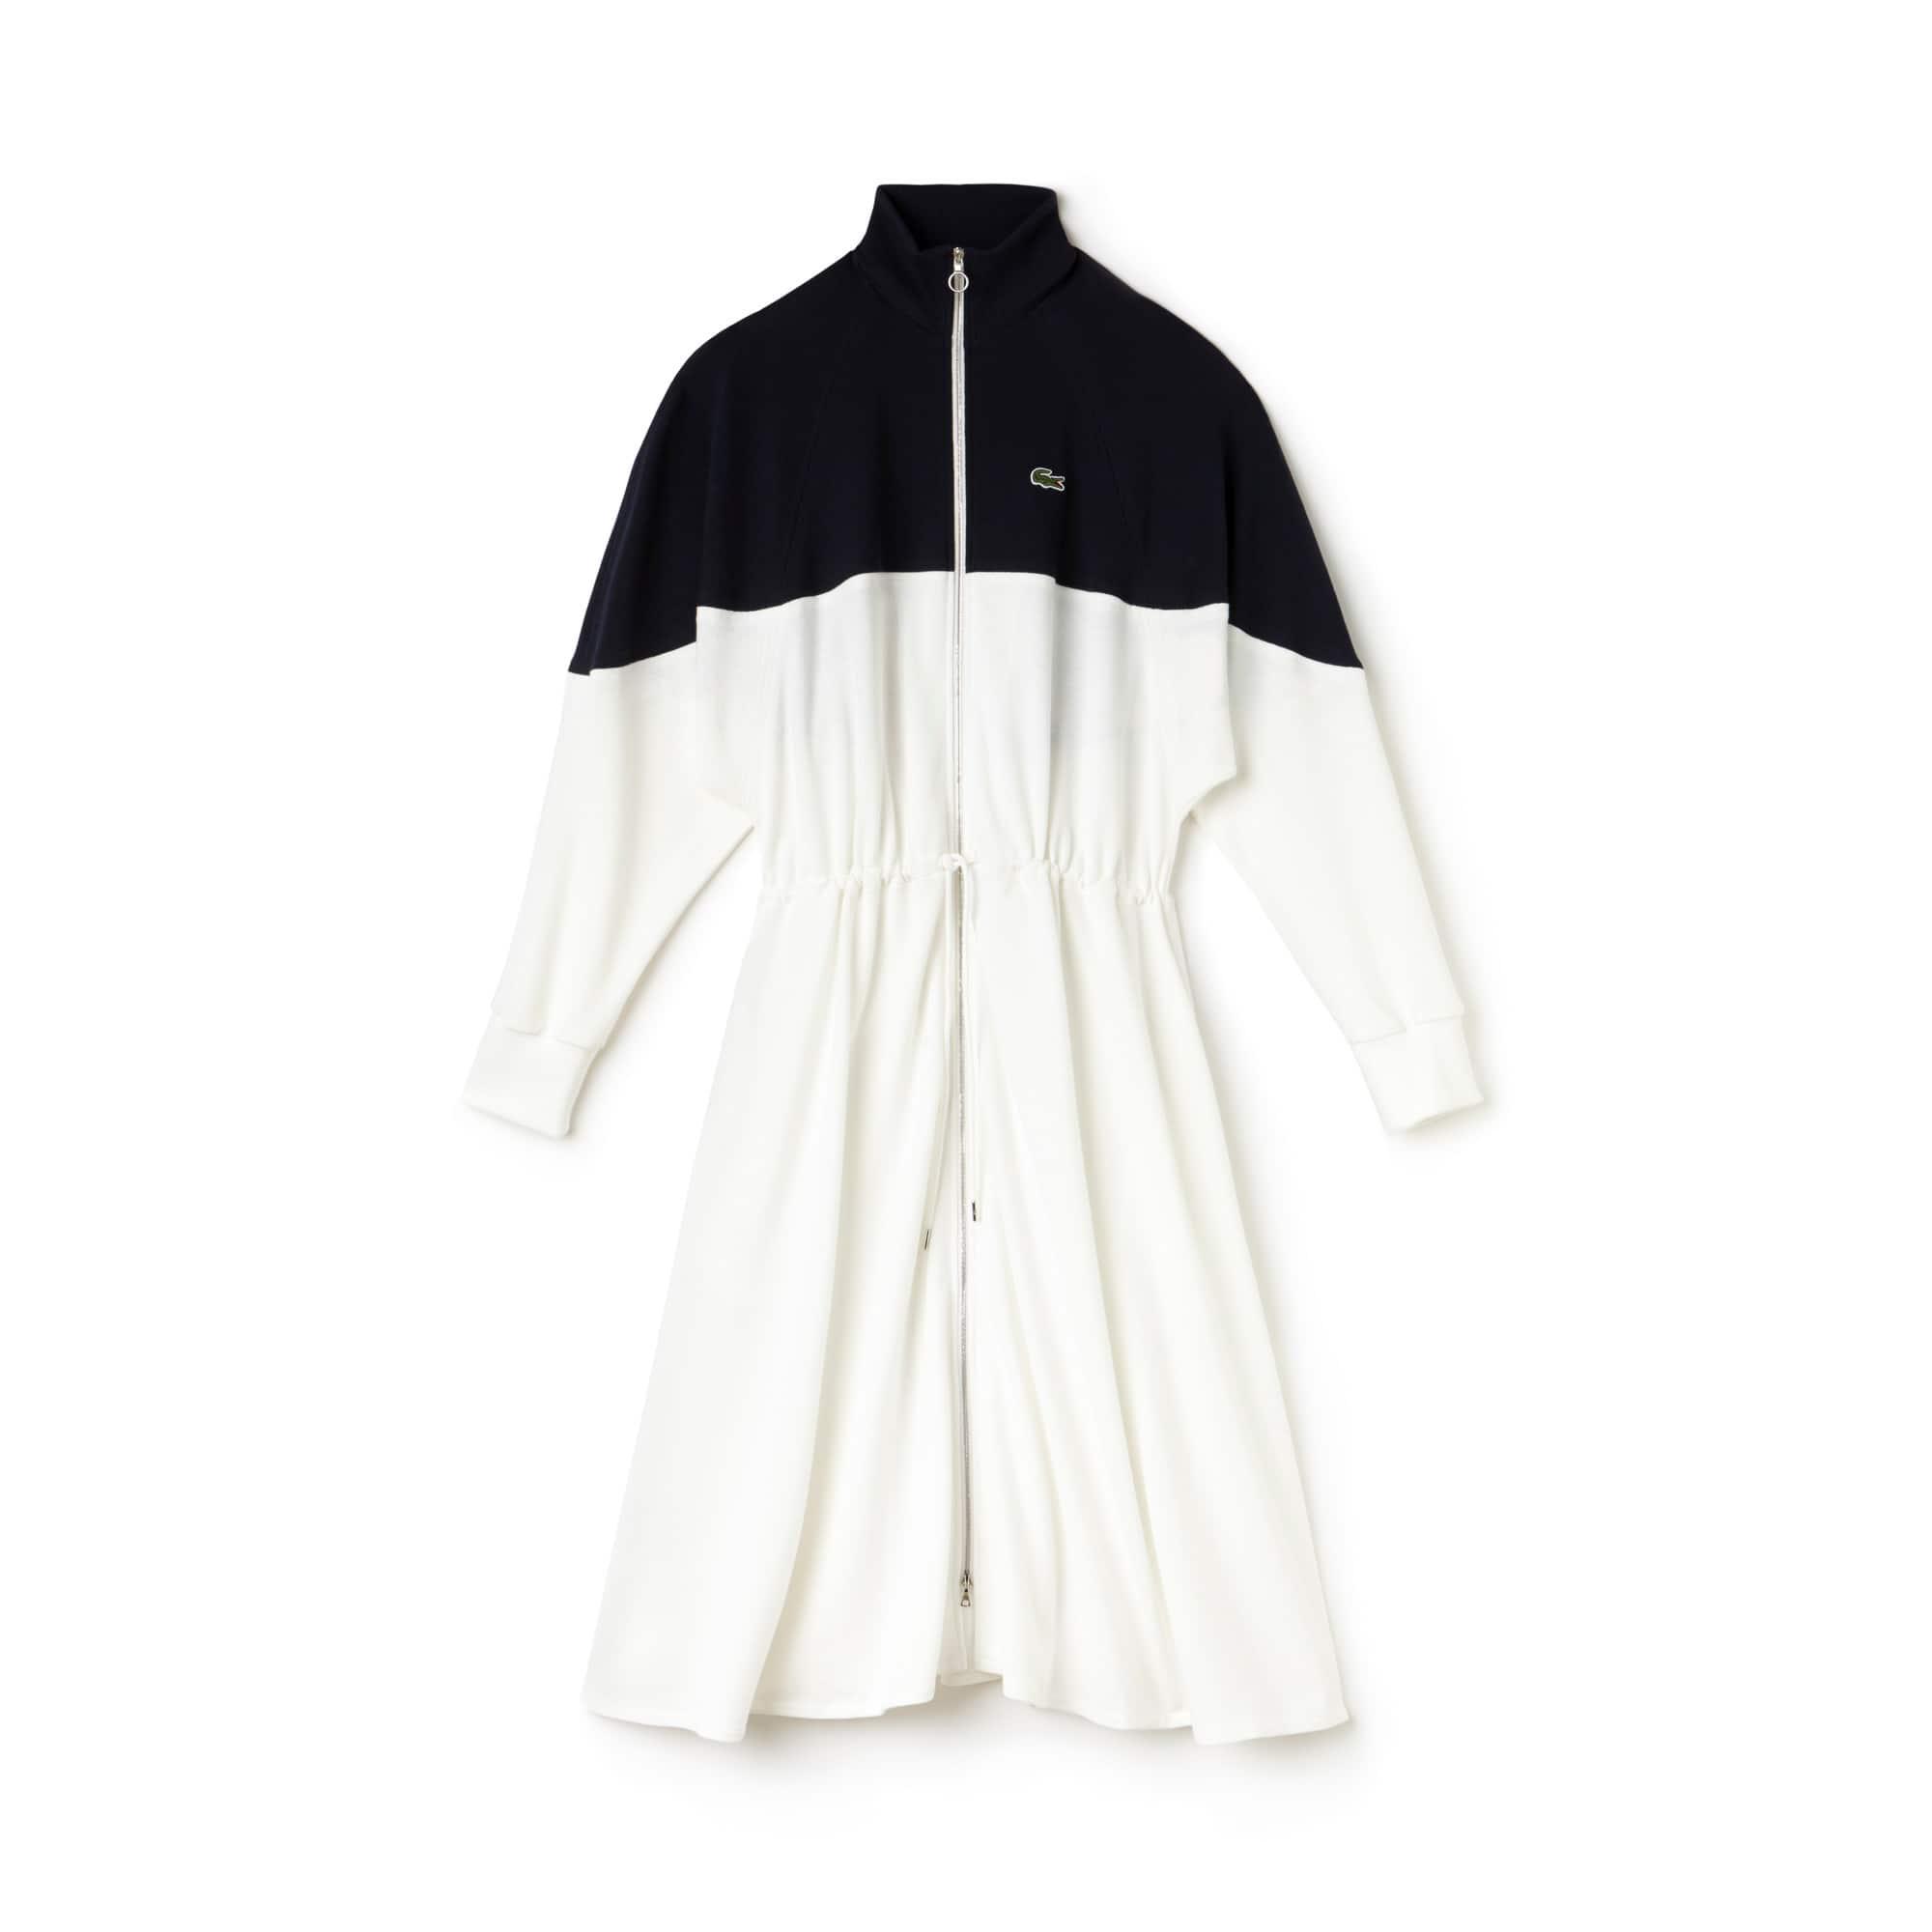 Women's Fashion Show Zippered Mid-Length Colorblock Piqué Dress